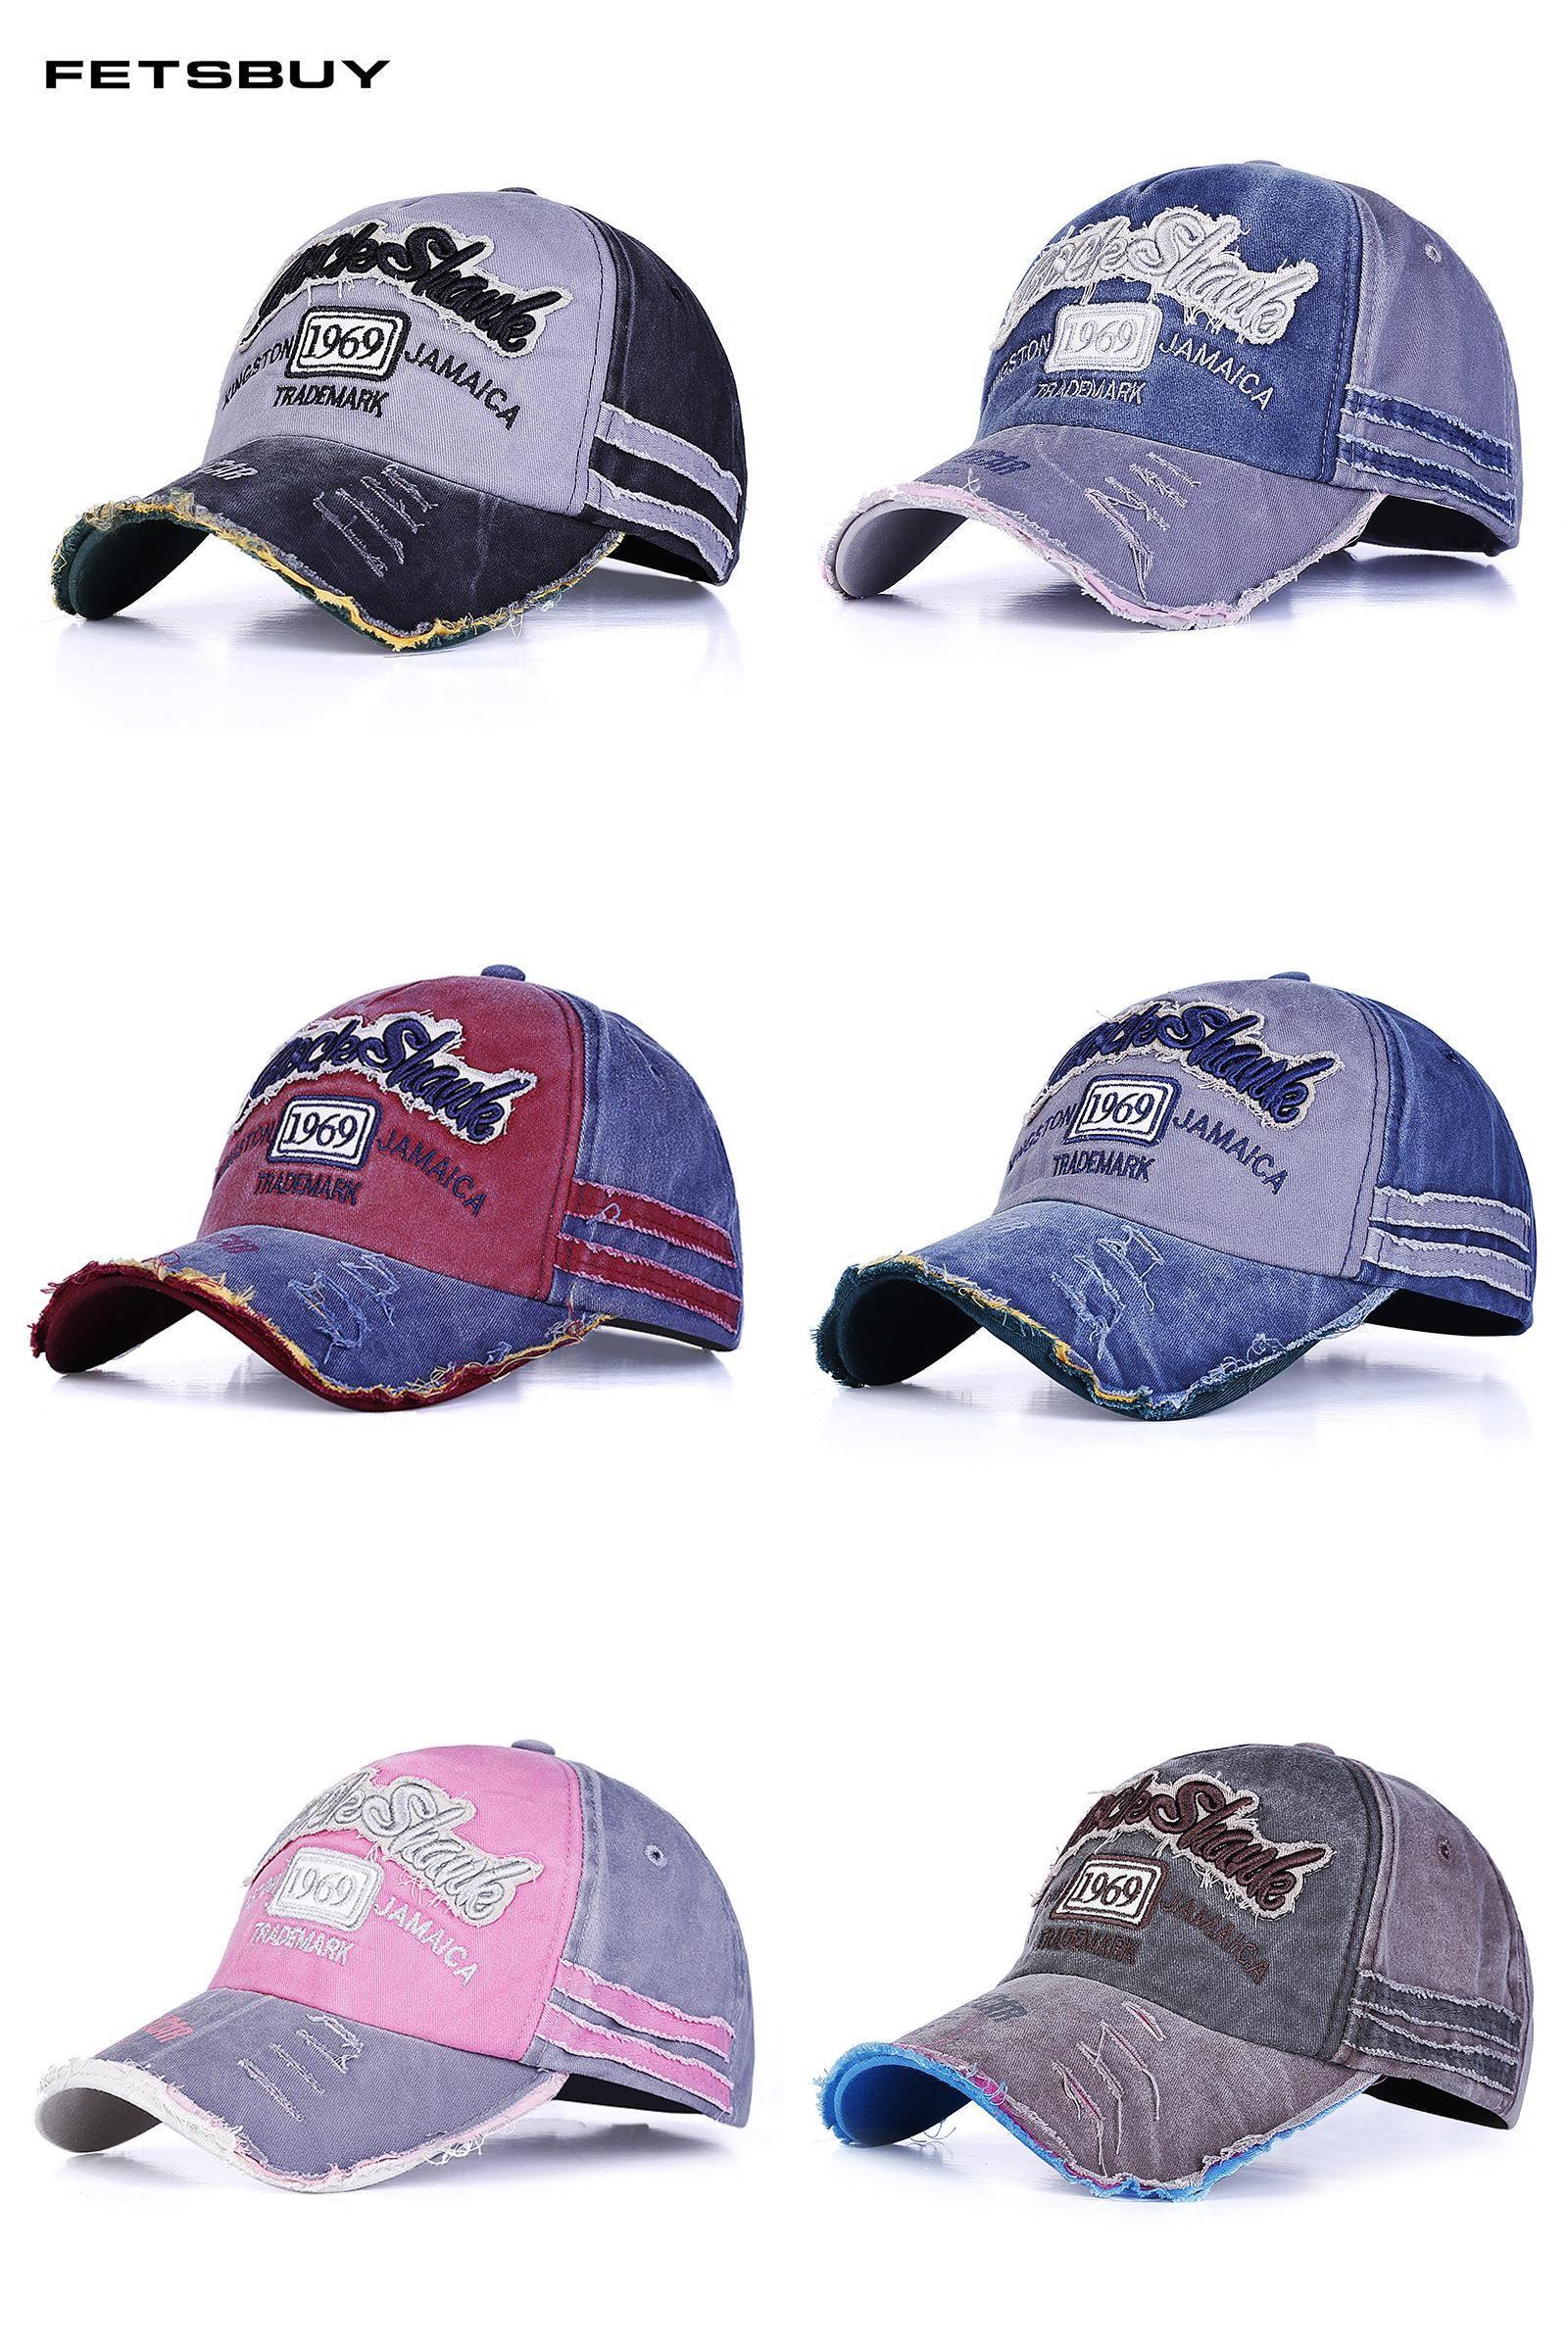 9bf5b82b440  Visit to Buy   FETSBUY  Brand Snapback Men Baseball Cap Women Caps Hats